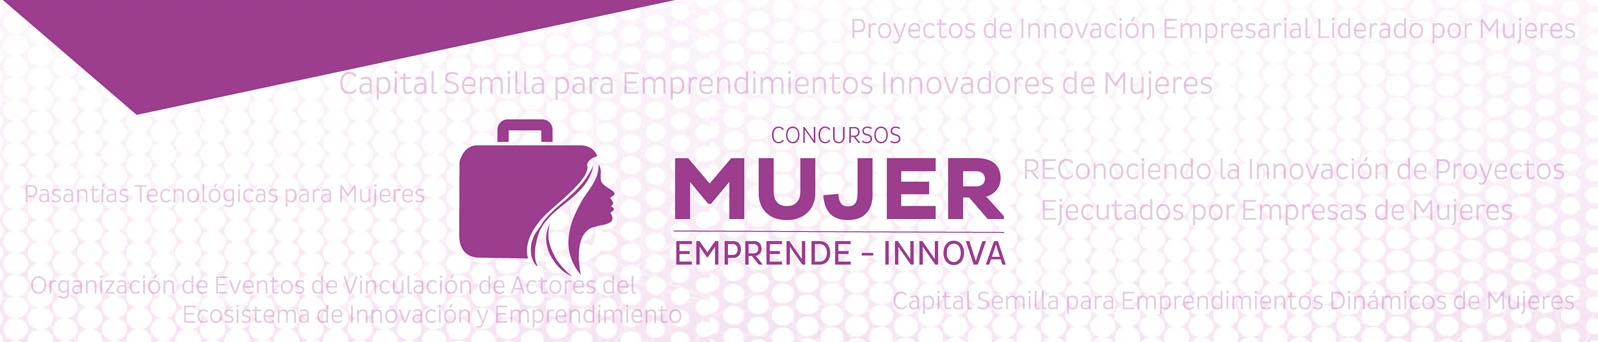 Concursos Mujer Emprende e Innova